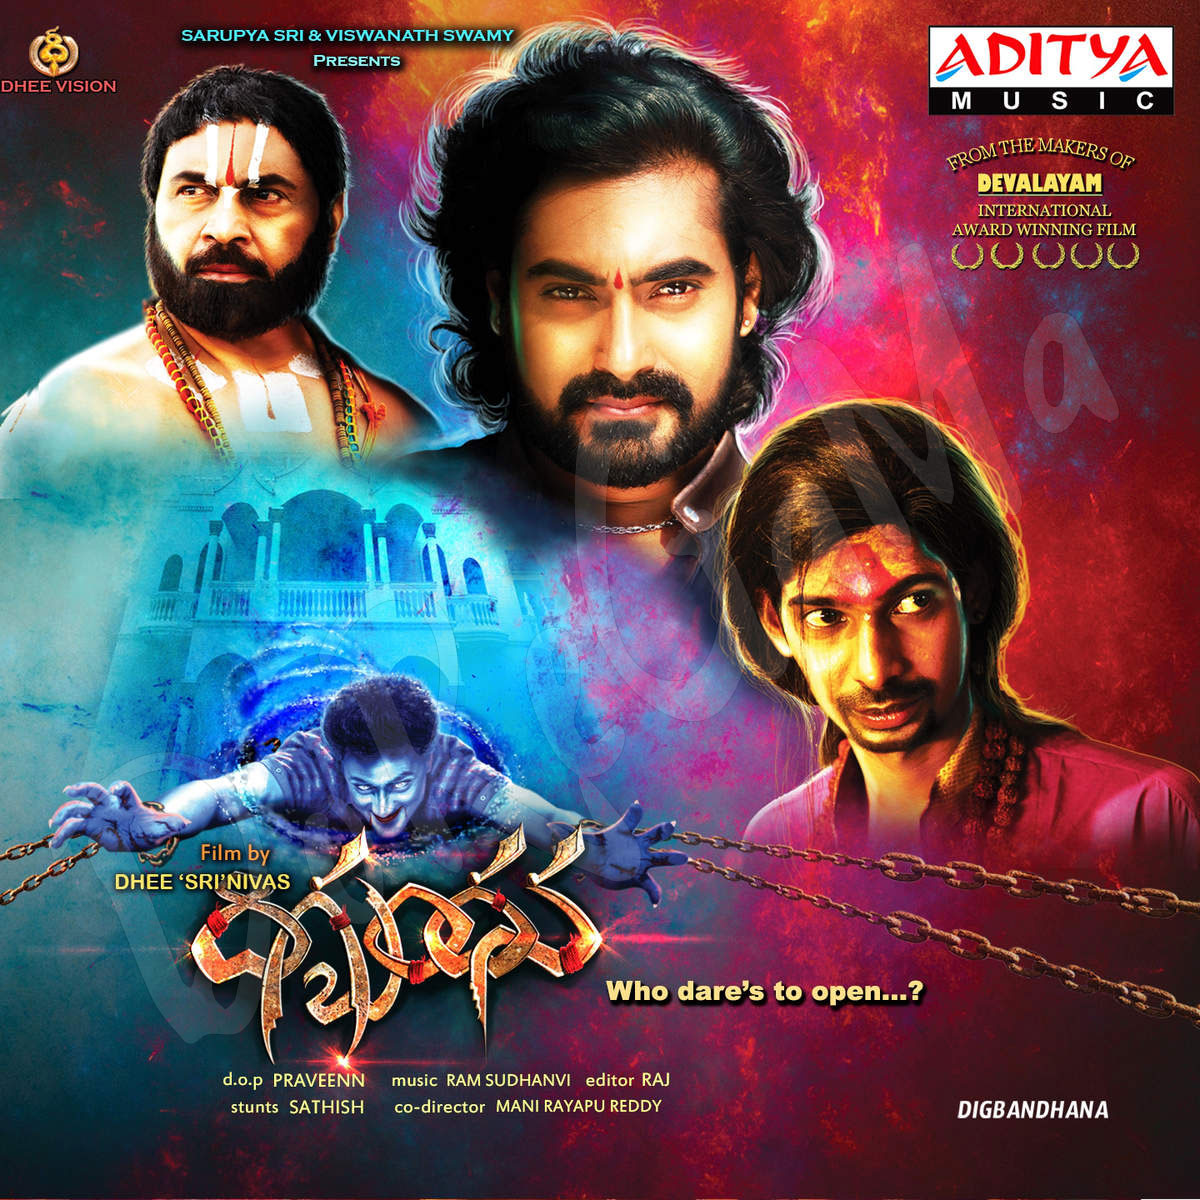 Digbandhana-Telugu-CD-FRont-Cover-Poster-Wallpaper